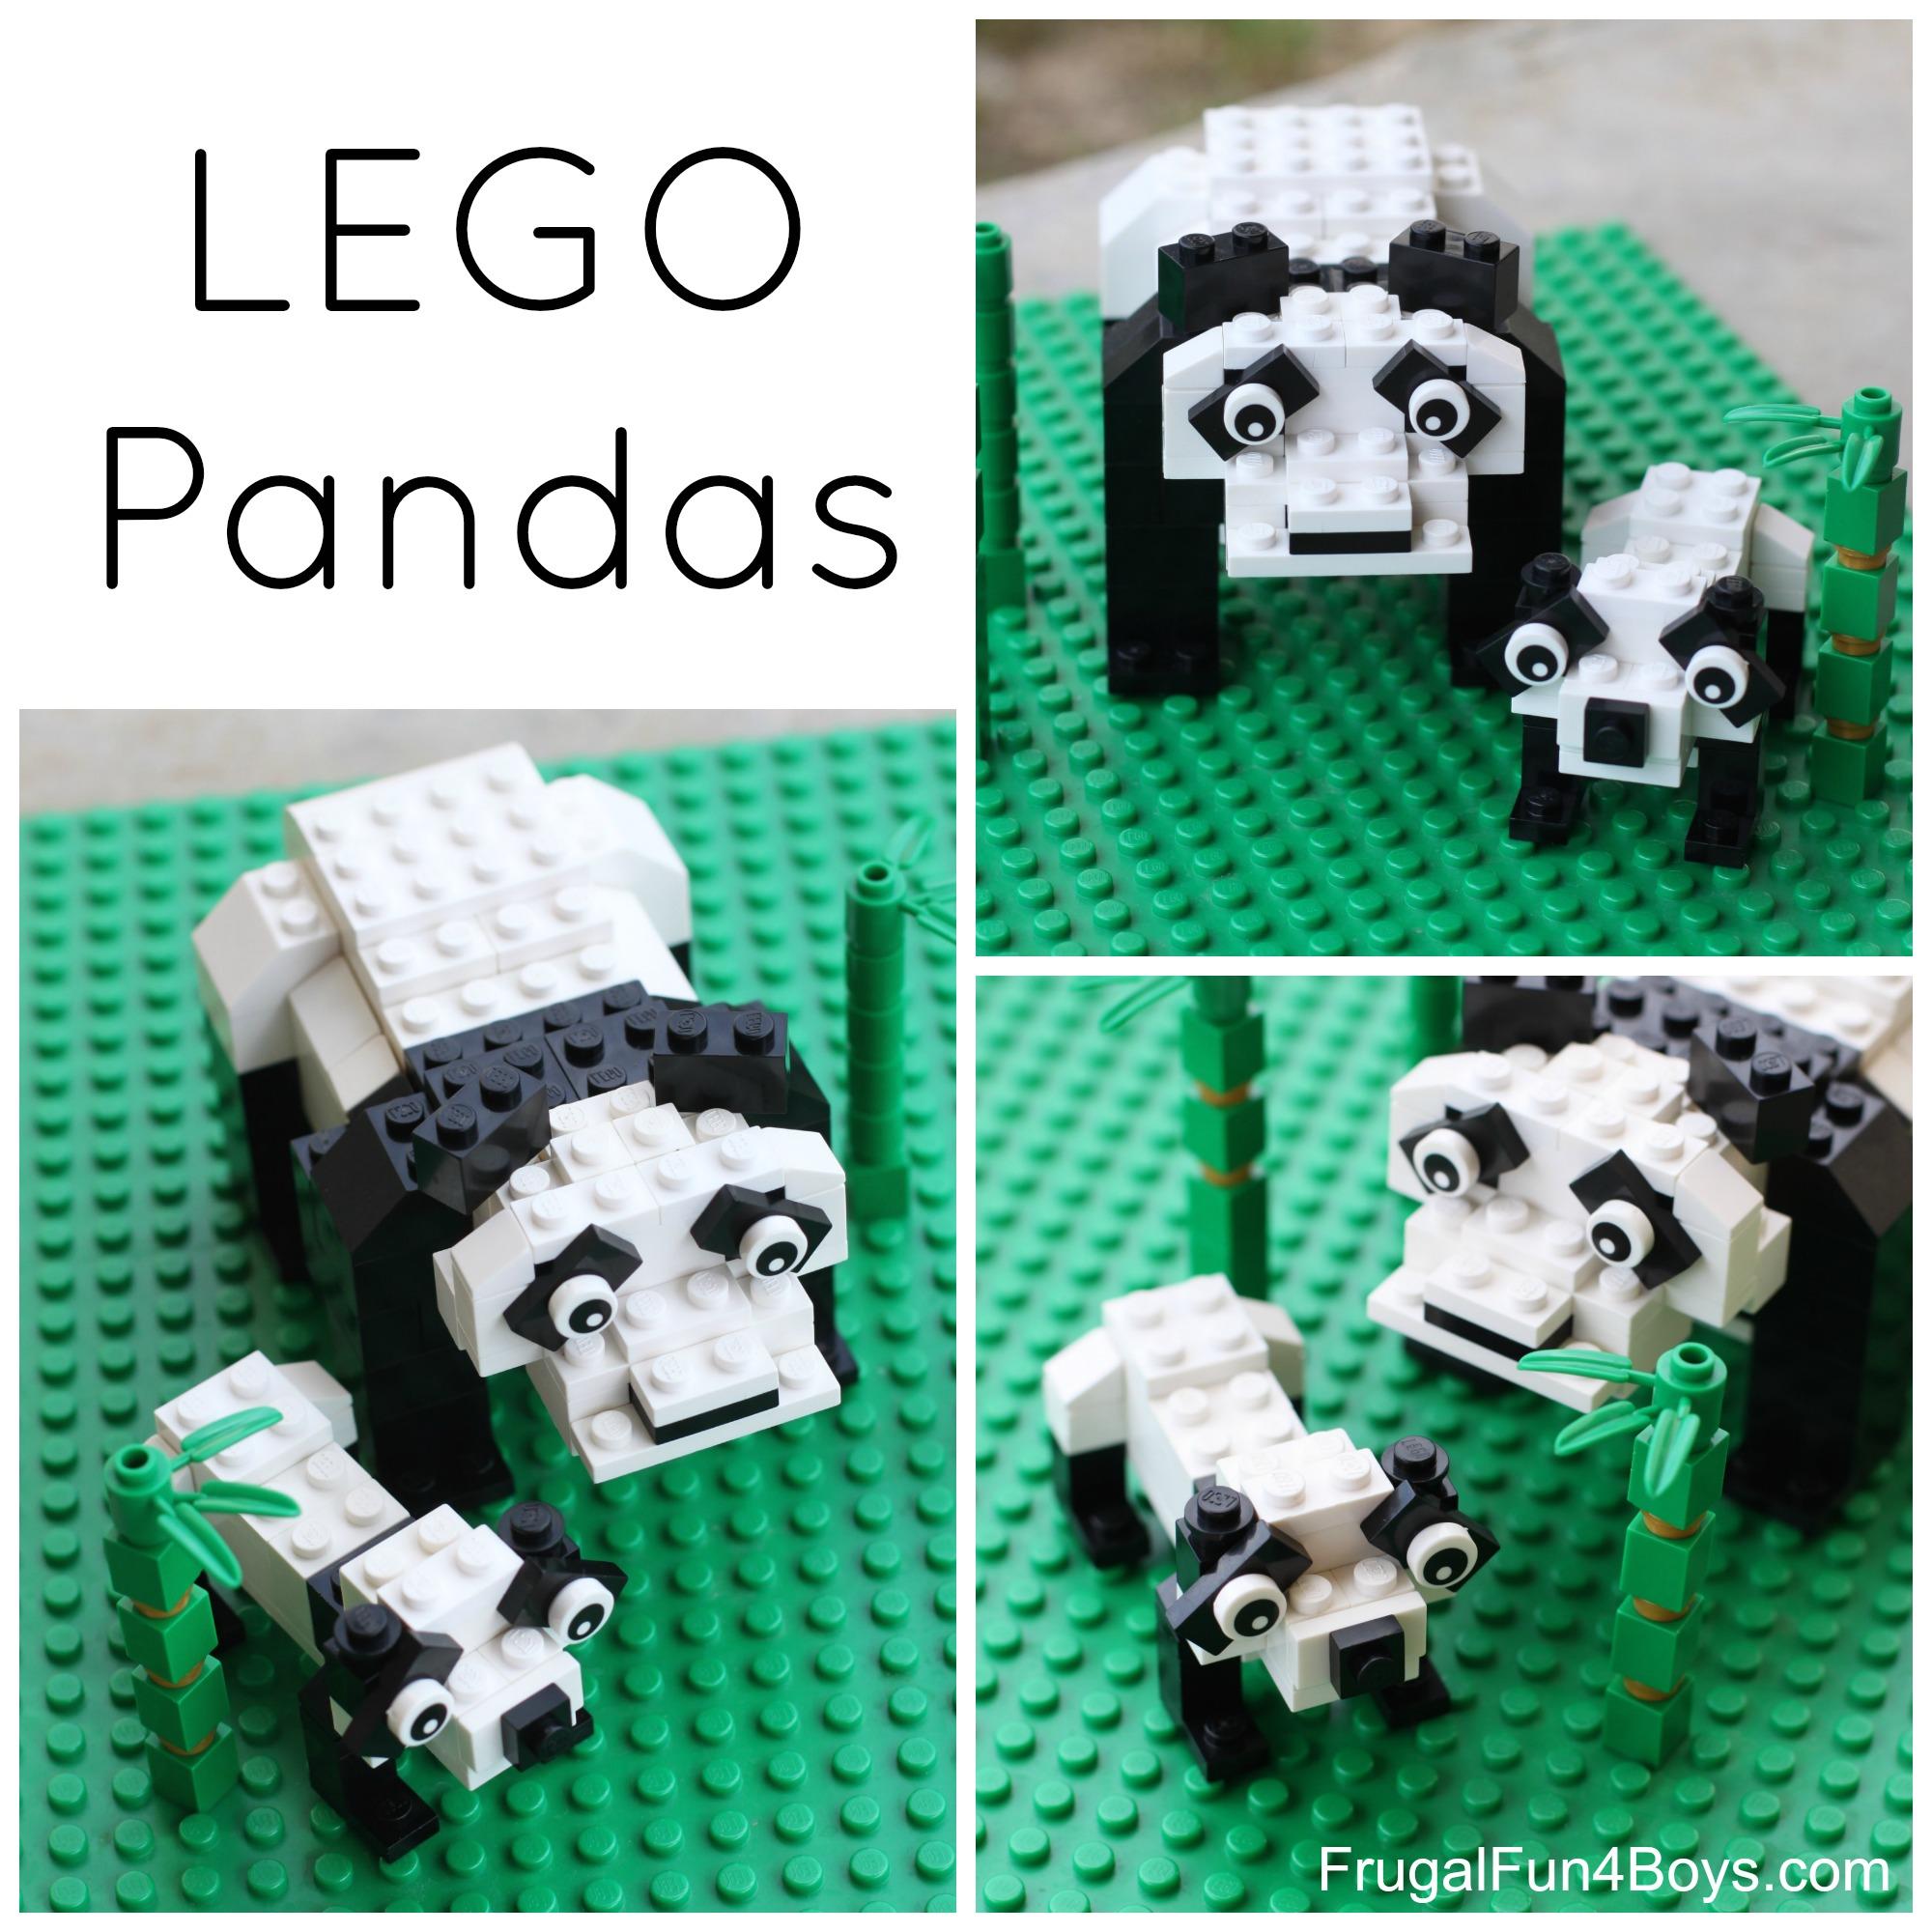 Lego Panda Bear Building Instructions Frugal Fun For Boys And Girls